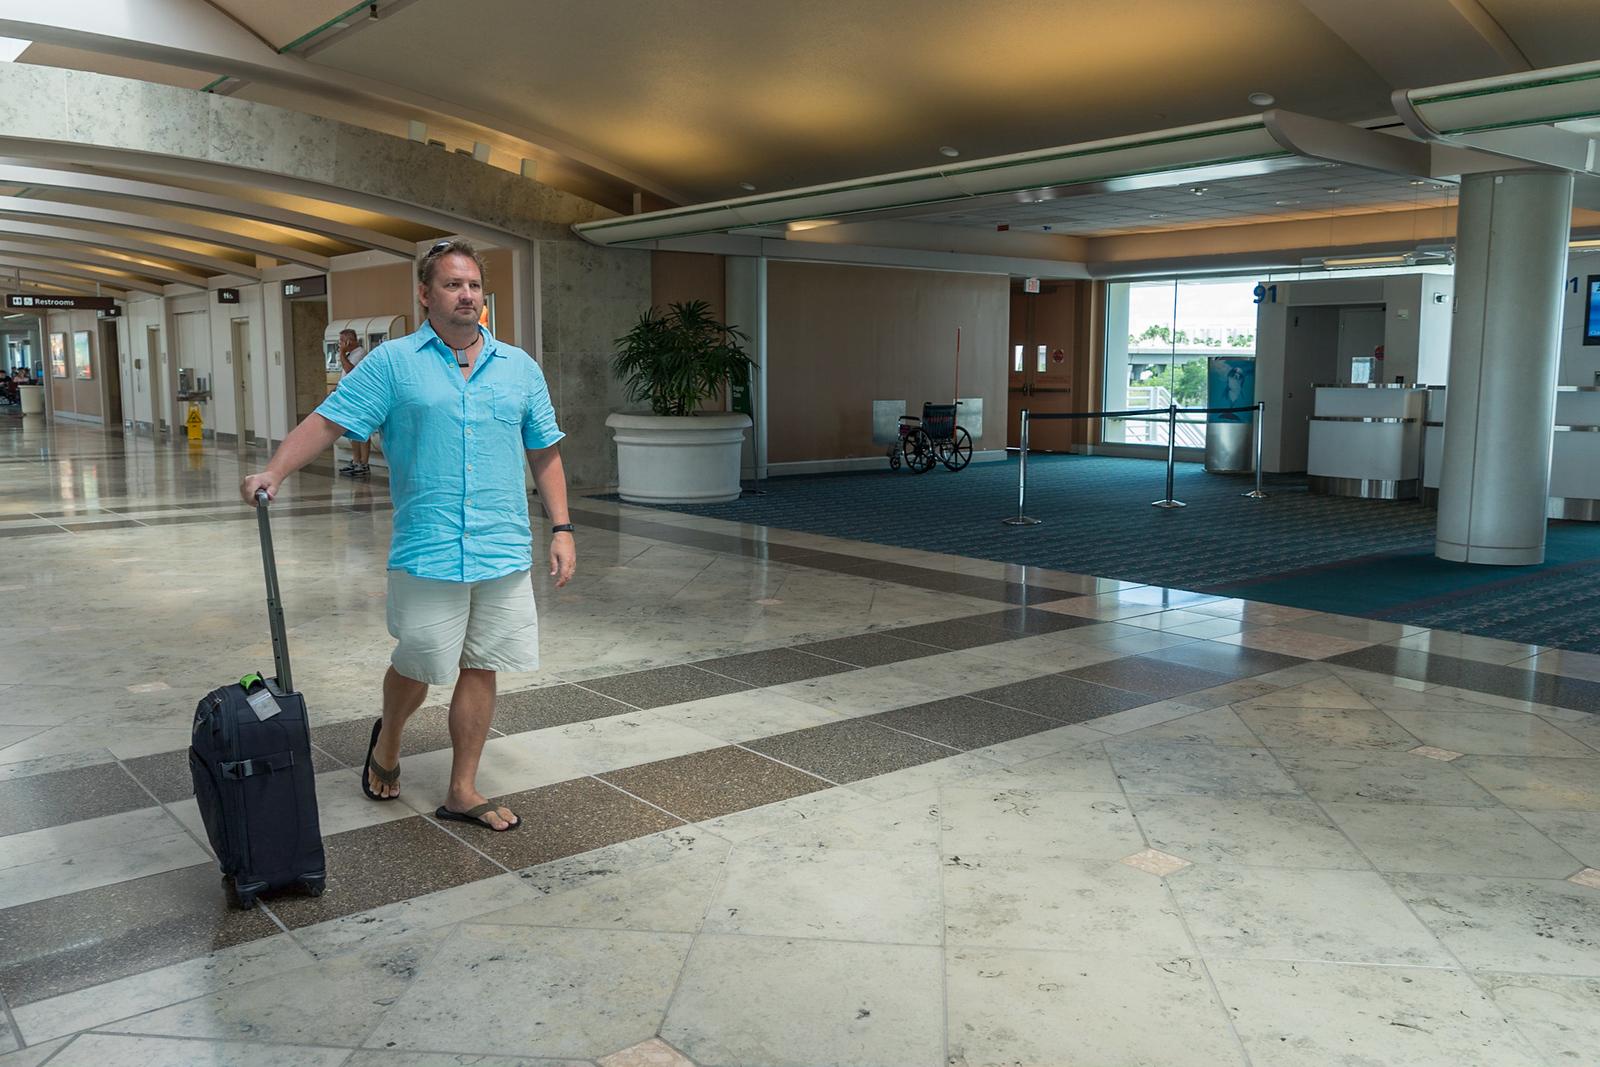 Travel Clothes for Men: Reversible Shorts